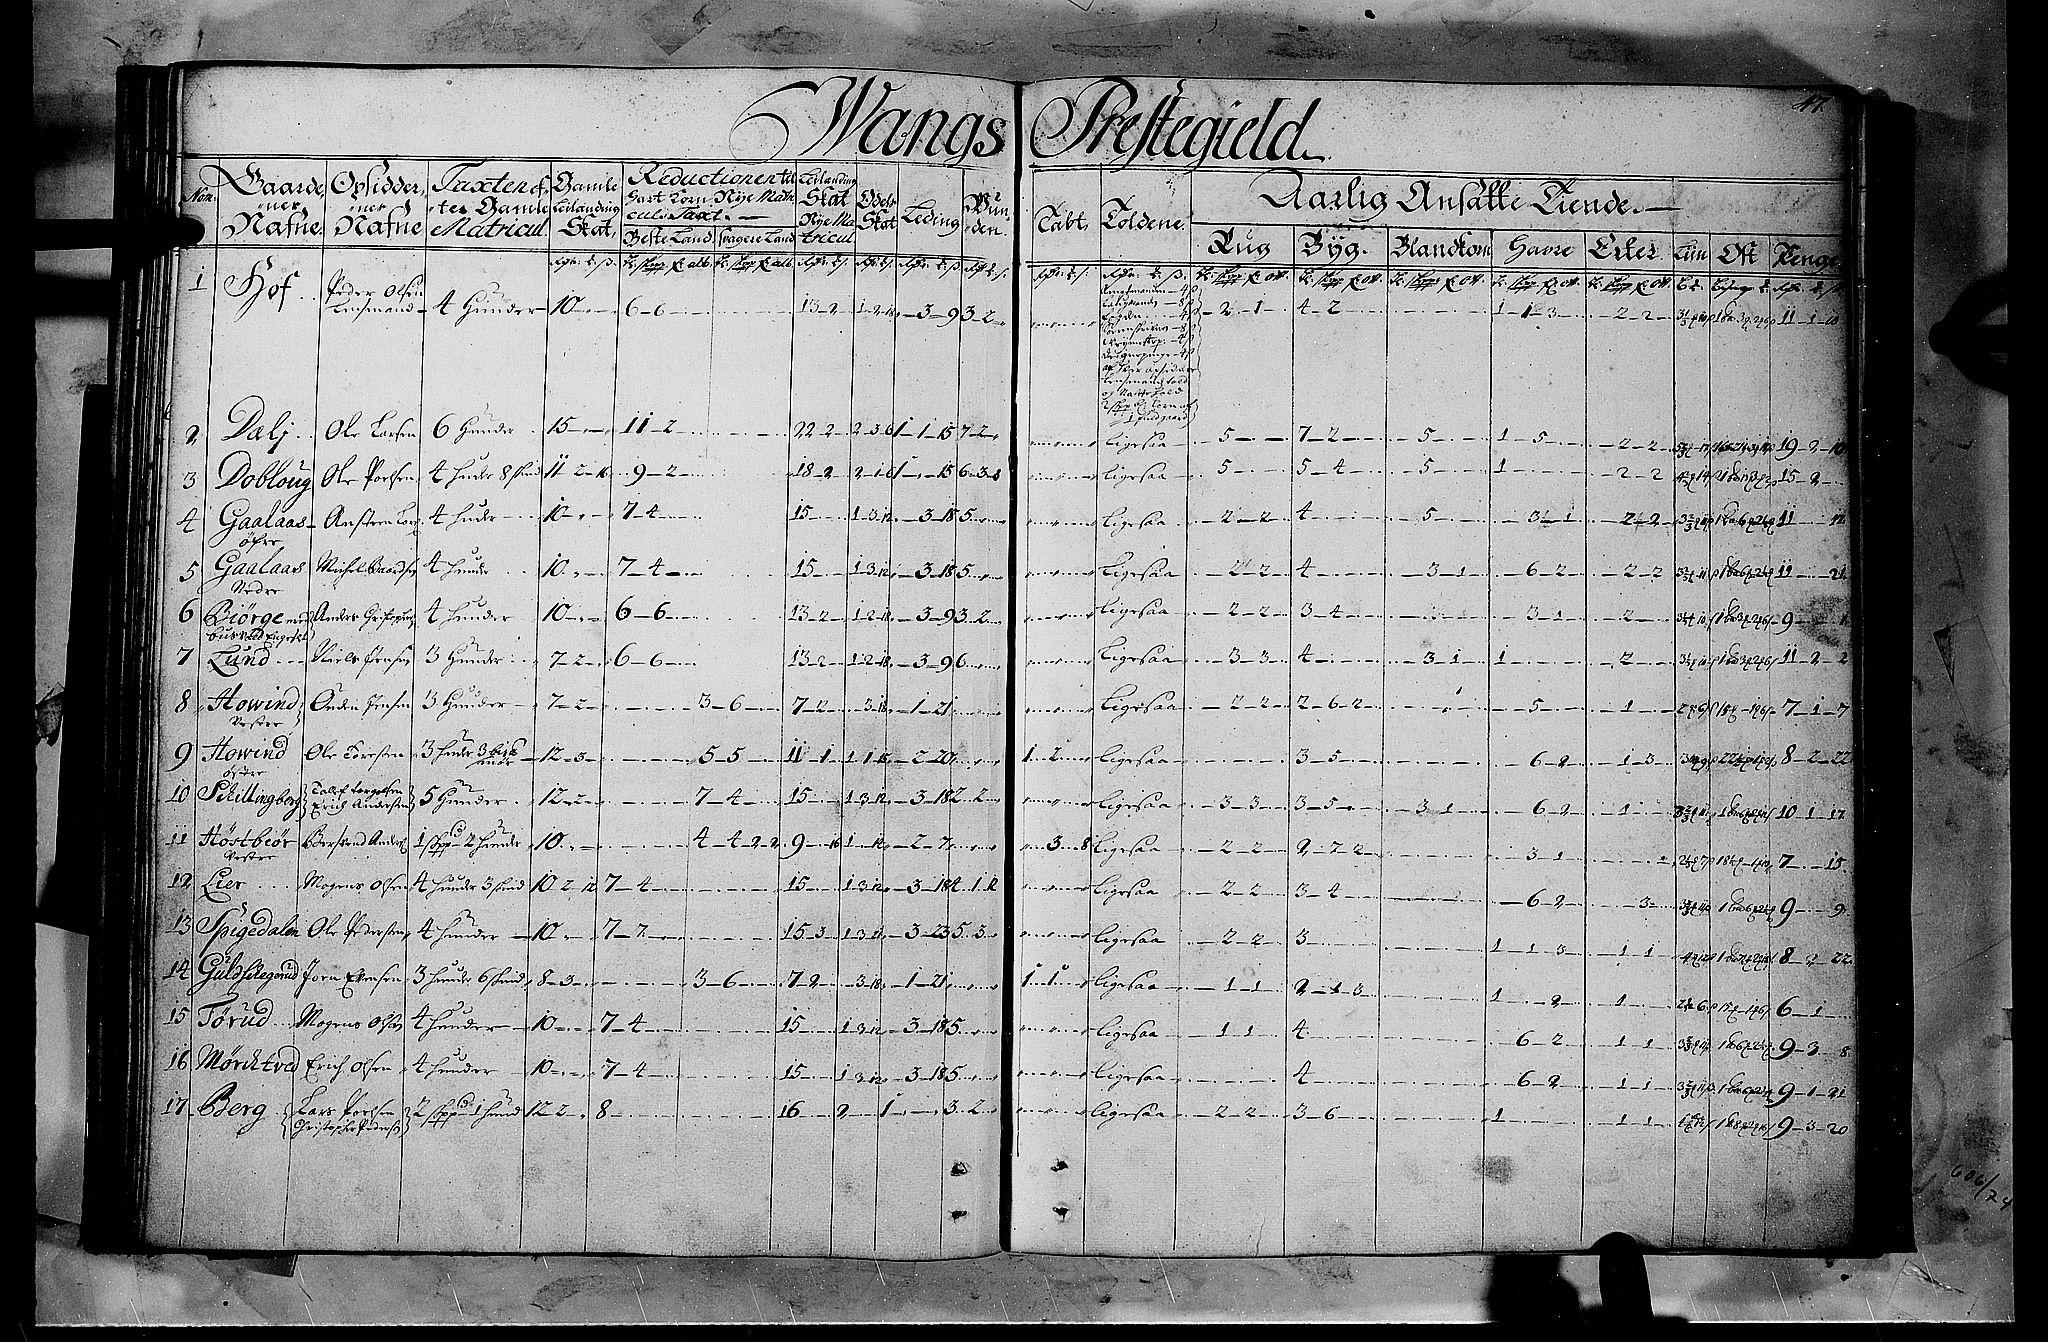 RA, Rentekammeret inntil 1814, Realistisk ordnet avdeling, Fb/L0008b: Ullerål allmenning, 1723, s. 46b-47a